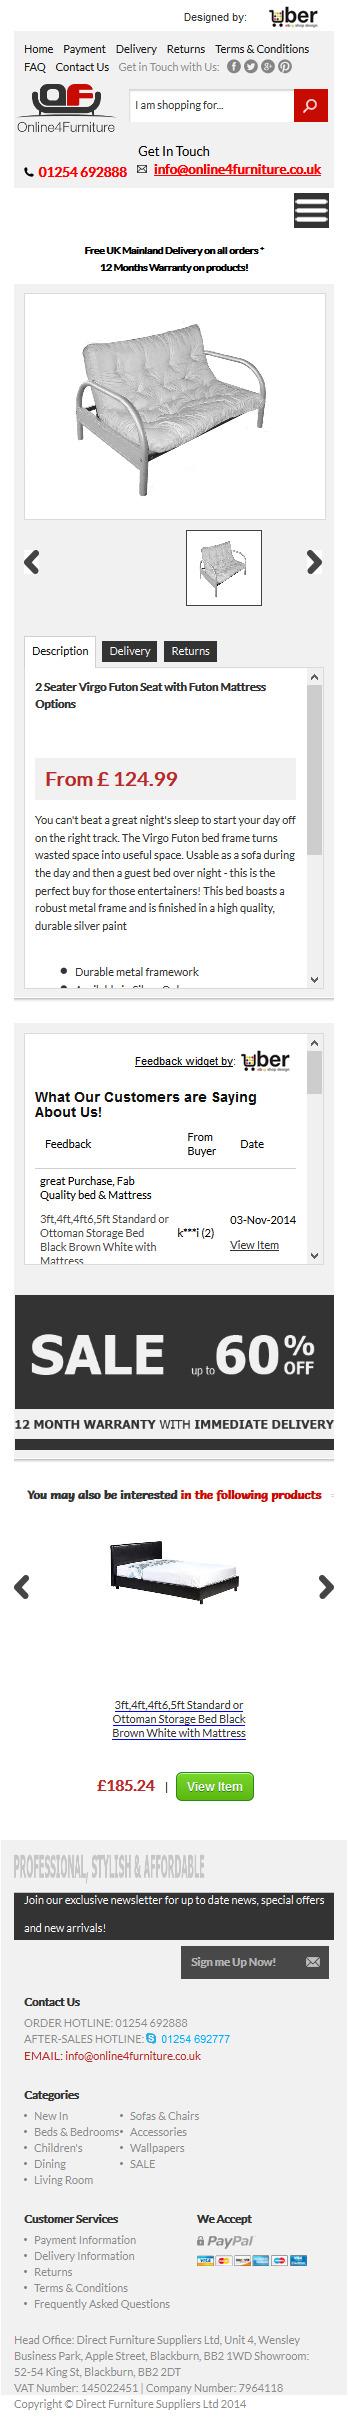 Online4Furniture ebay item template design smart phone view